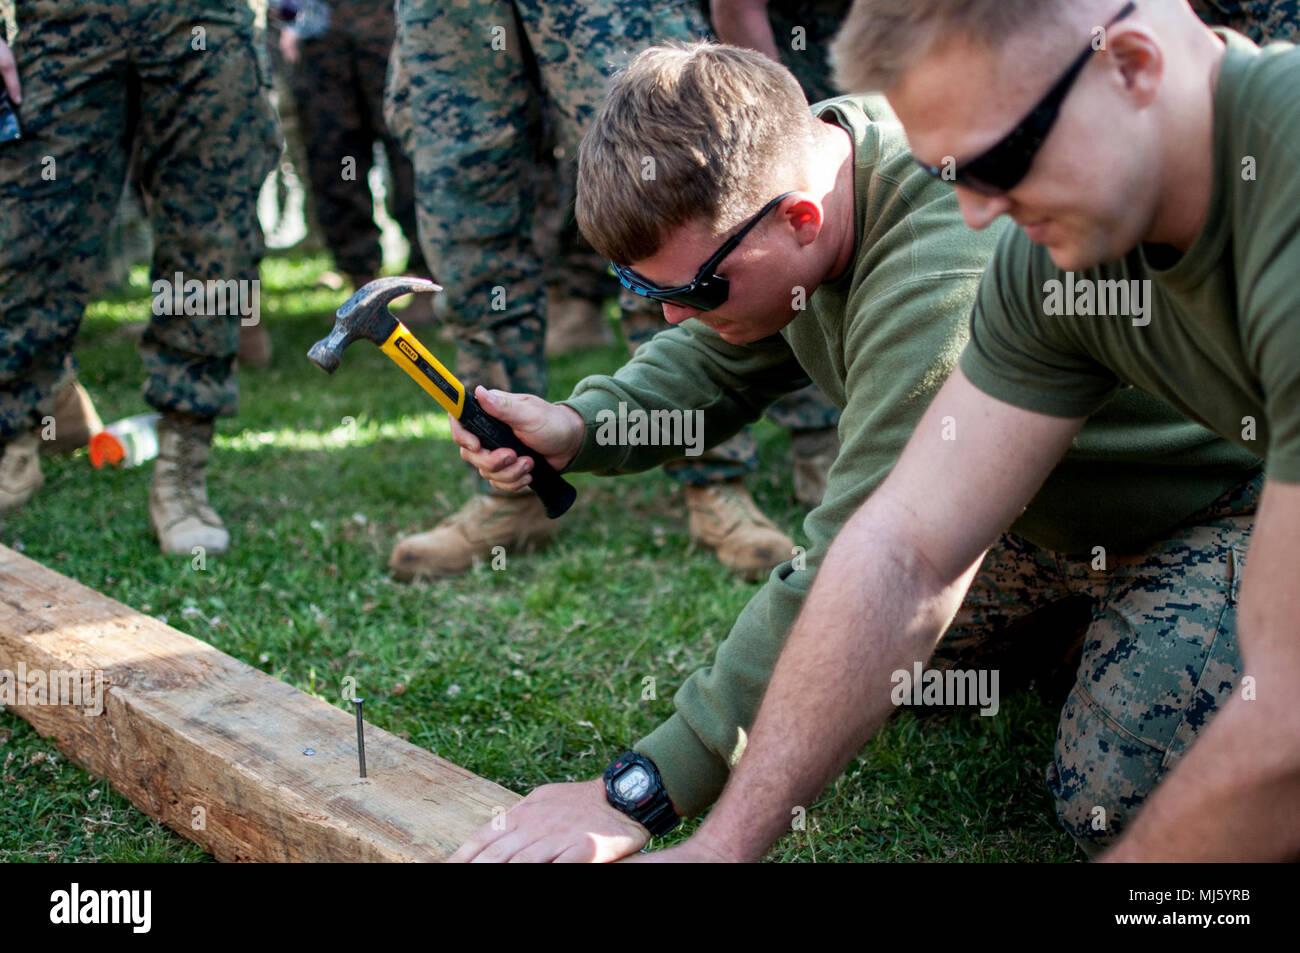 Military Engineers Stockfotos & Military Engineers Bilder - Alamy